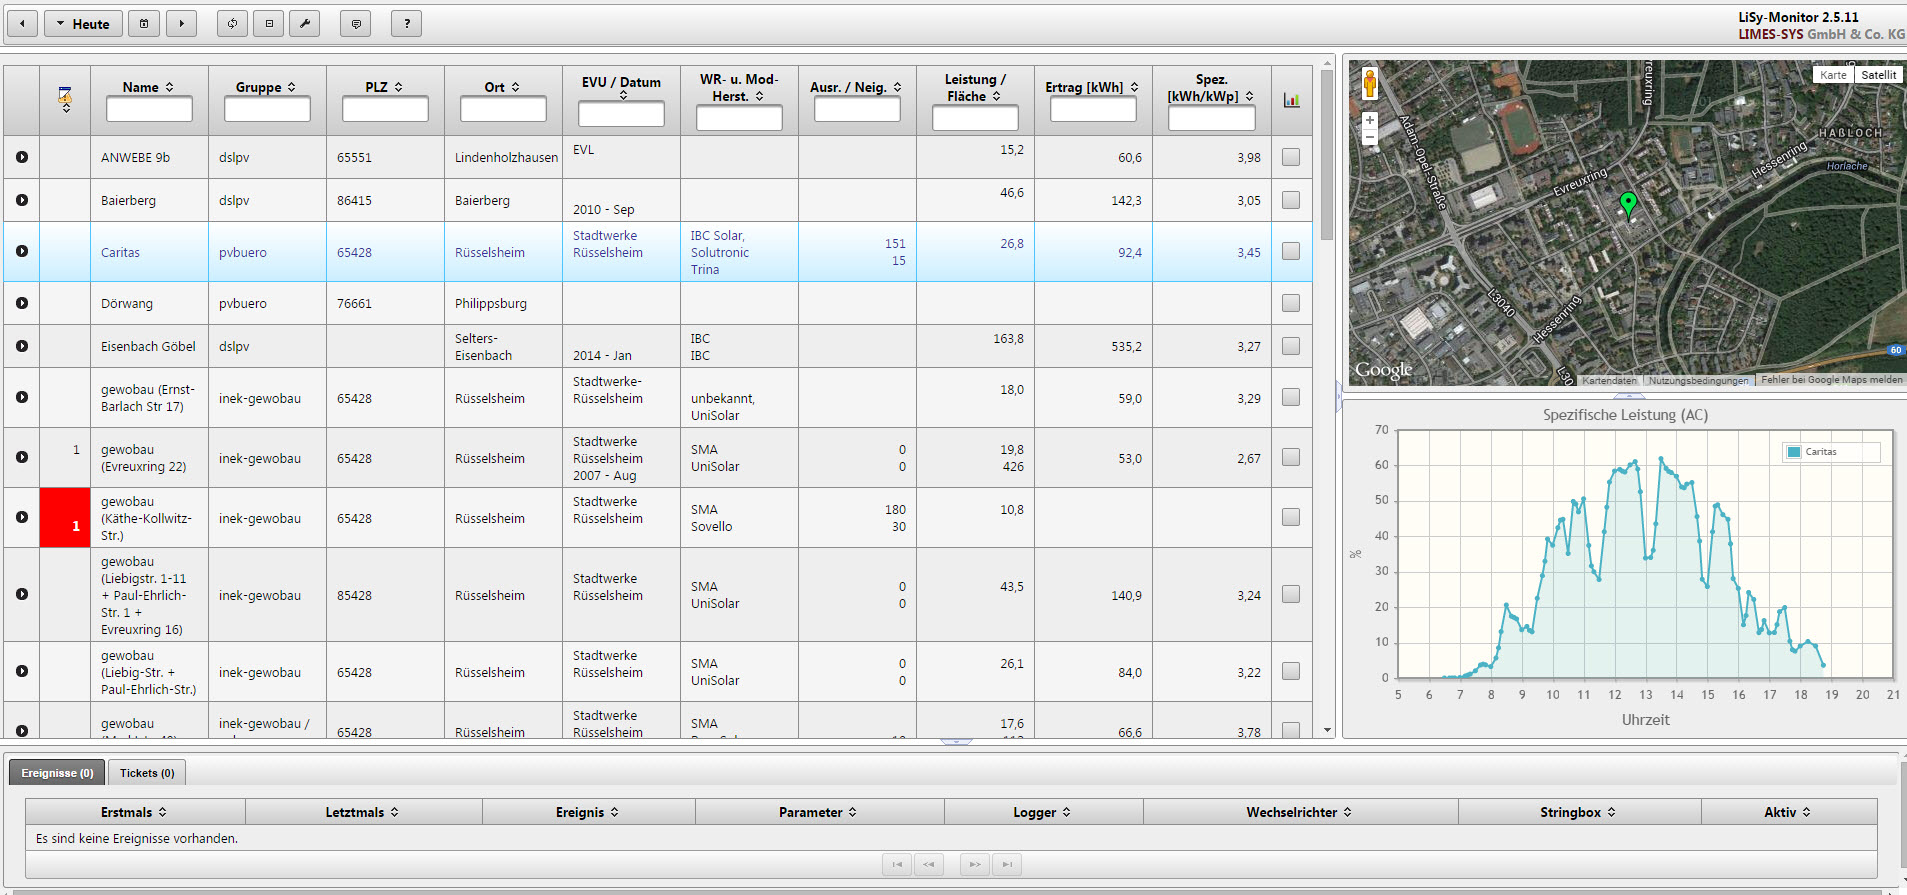 Weboberfläche des Lisy Solarstatistik Metaportals